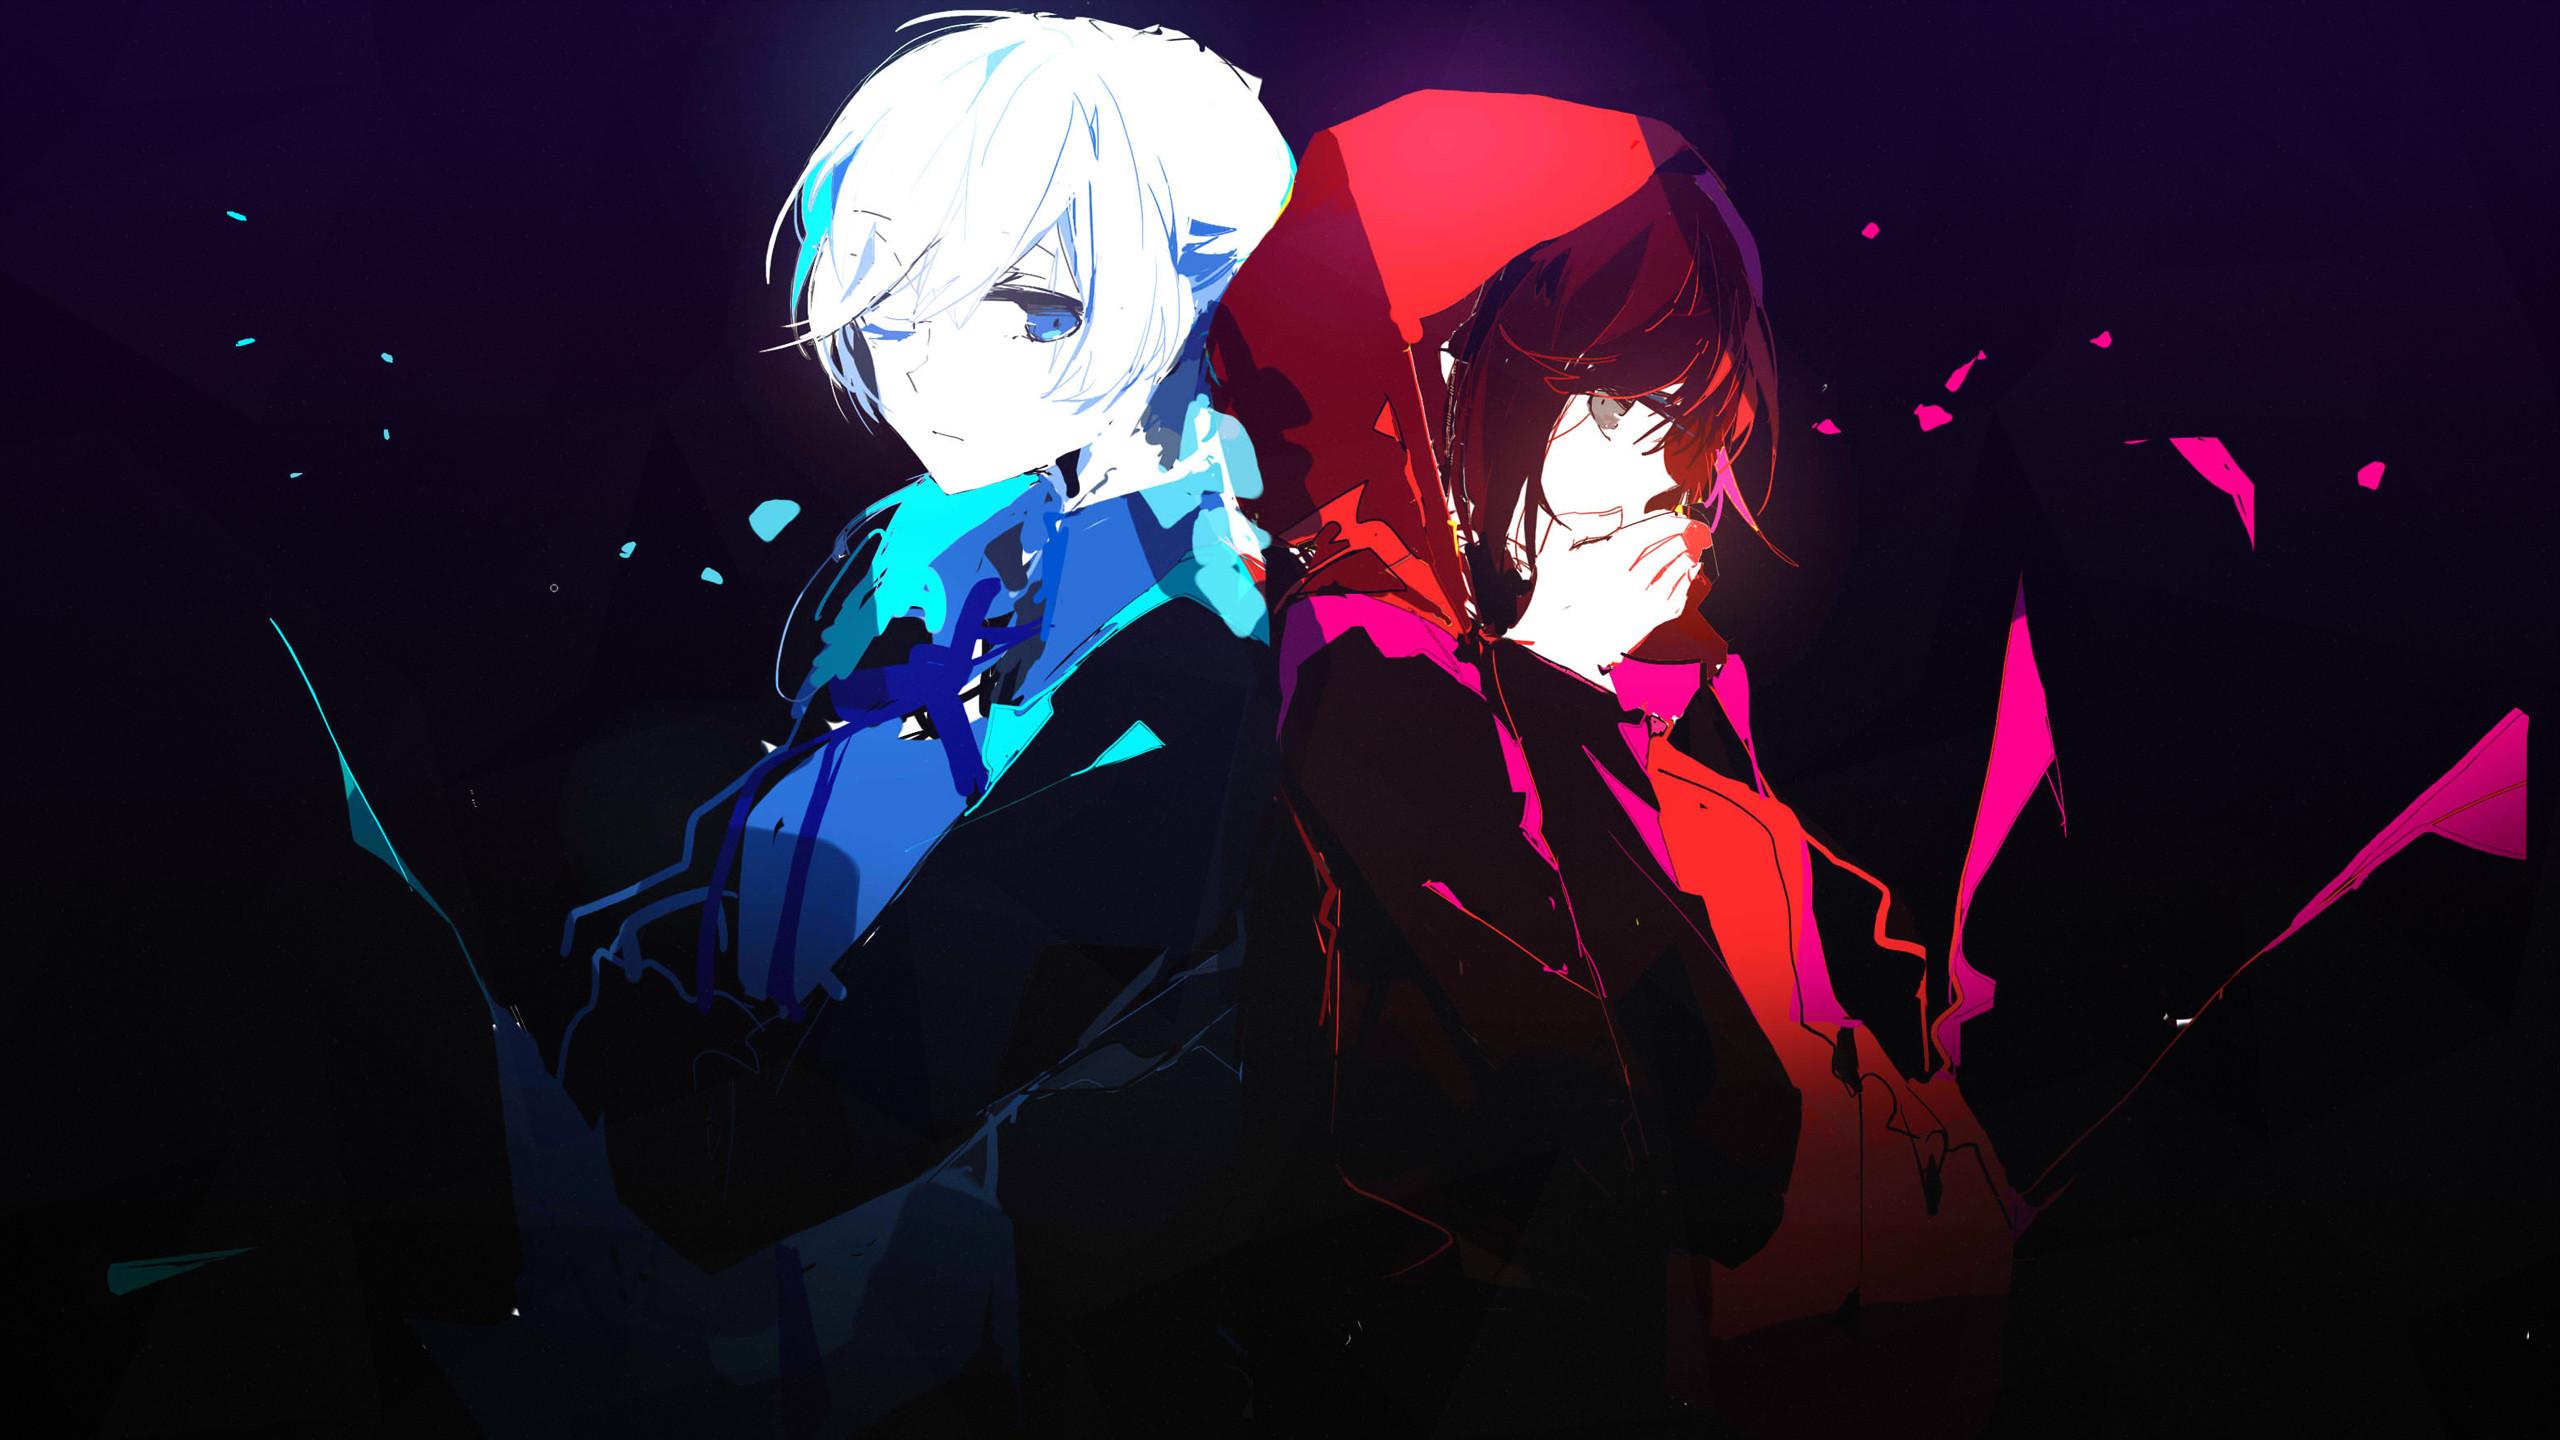 Anime – RWBY Ruby Rose (RWBY) Weiss Schnee Wallpaper